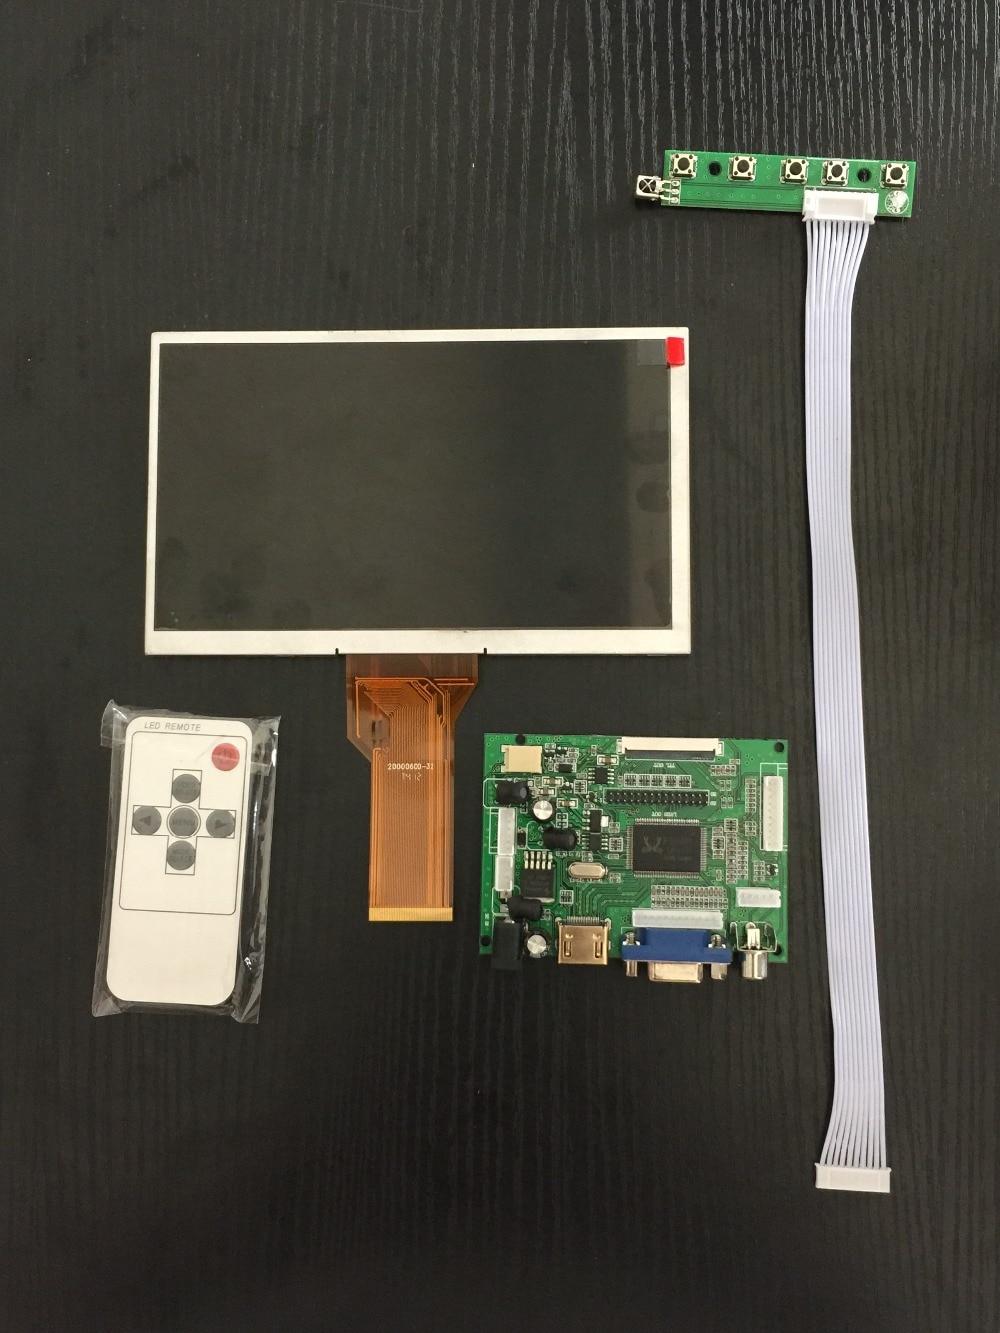 LCD Module 7 inch LCD Screen for Raspberry Pi 3 with driver board Remote Control 800*480 for Raspberry Pi 2 Banana Pi Orange Pi